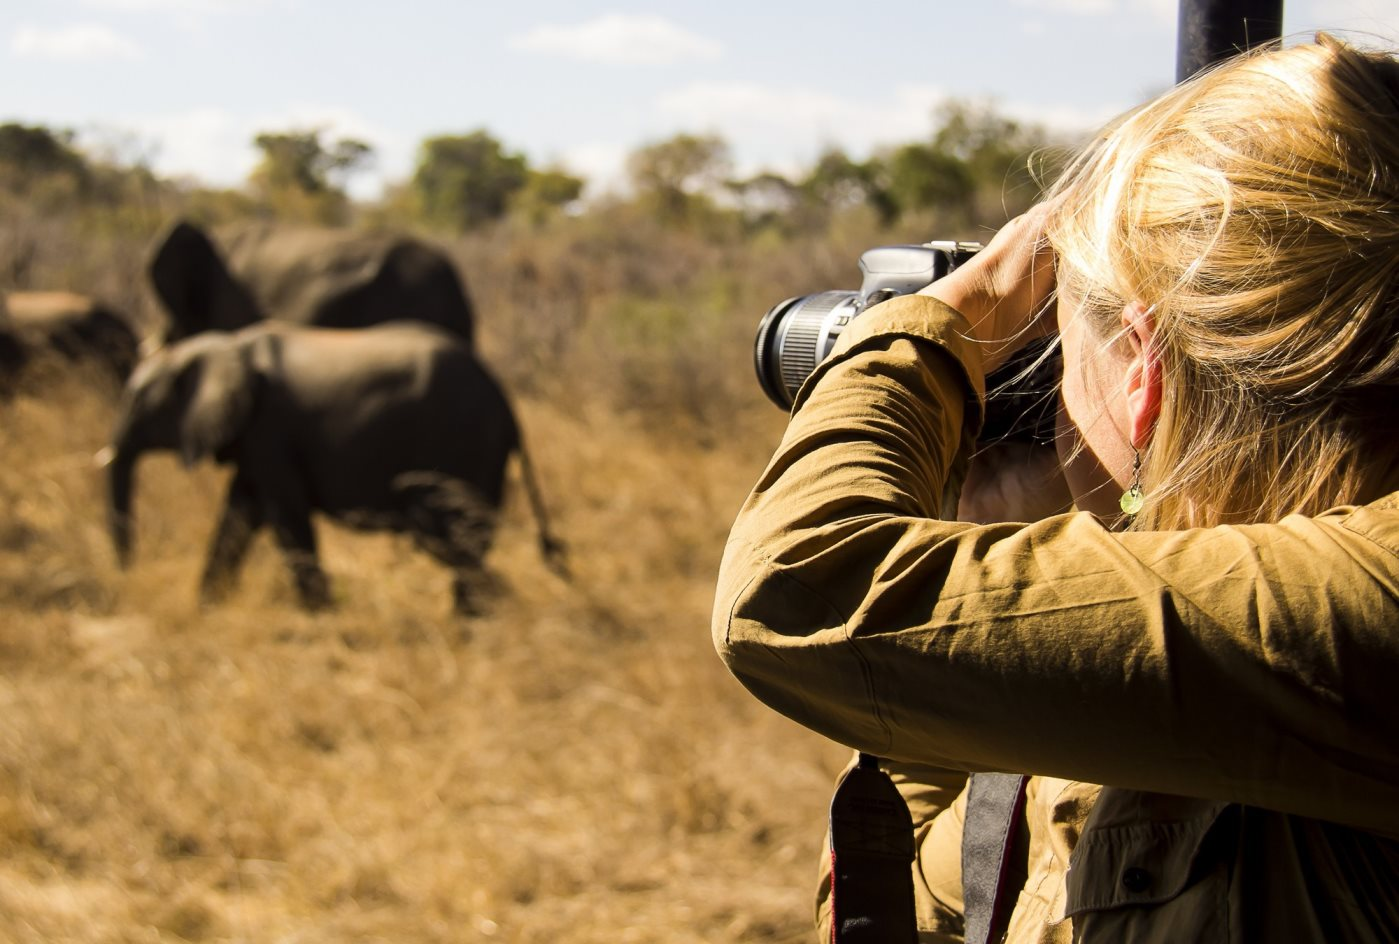 photographysafari 4 - Tips to Take Awesome Photos During a Safari